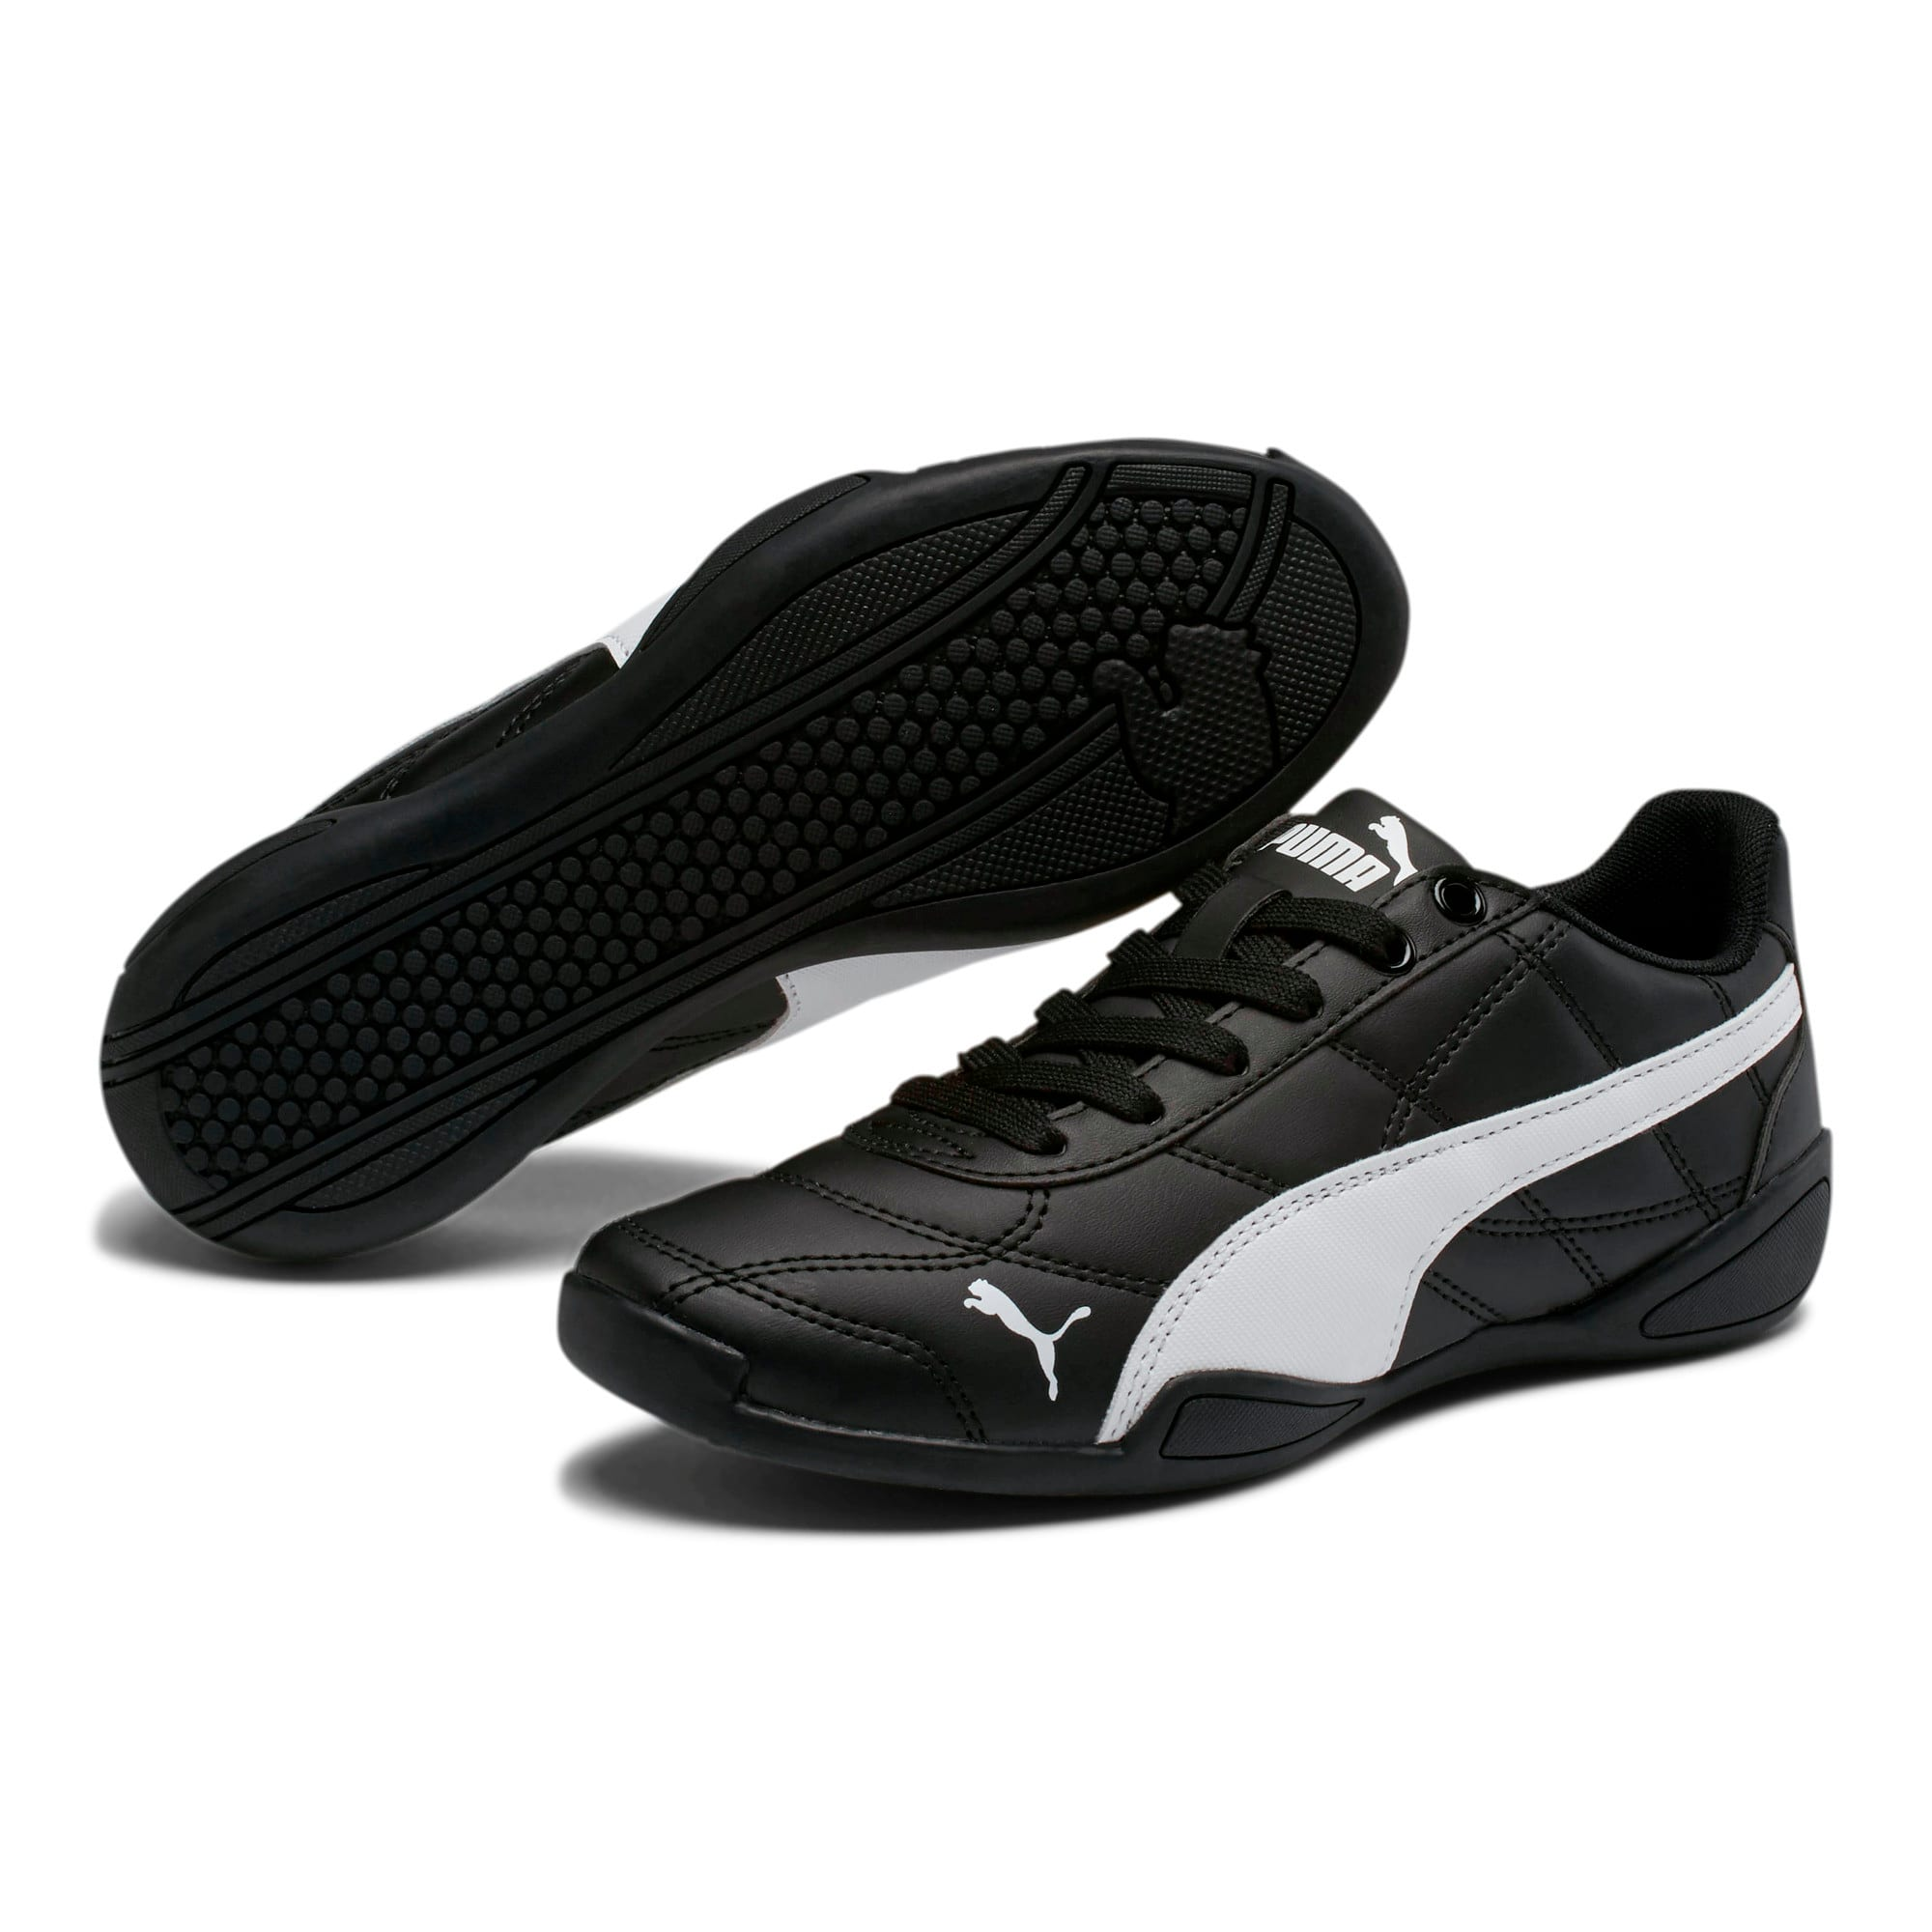 Thumbnail 2 of Tune Cat 3 Shoes JR, Puma Black-Puma White, medium